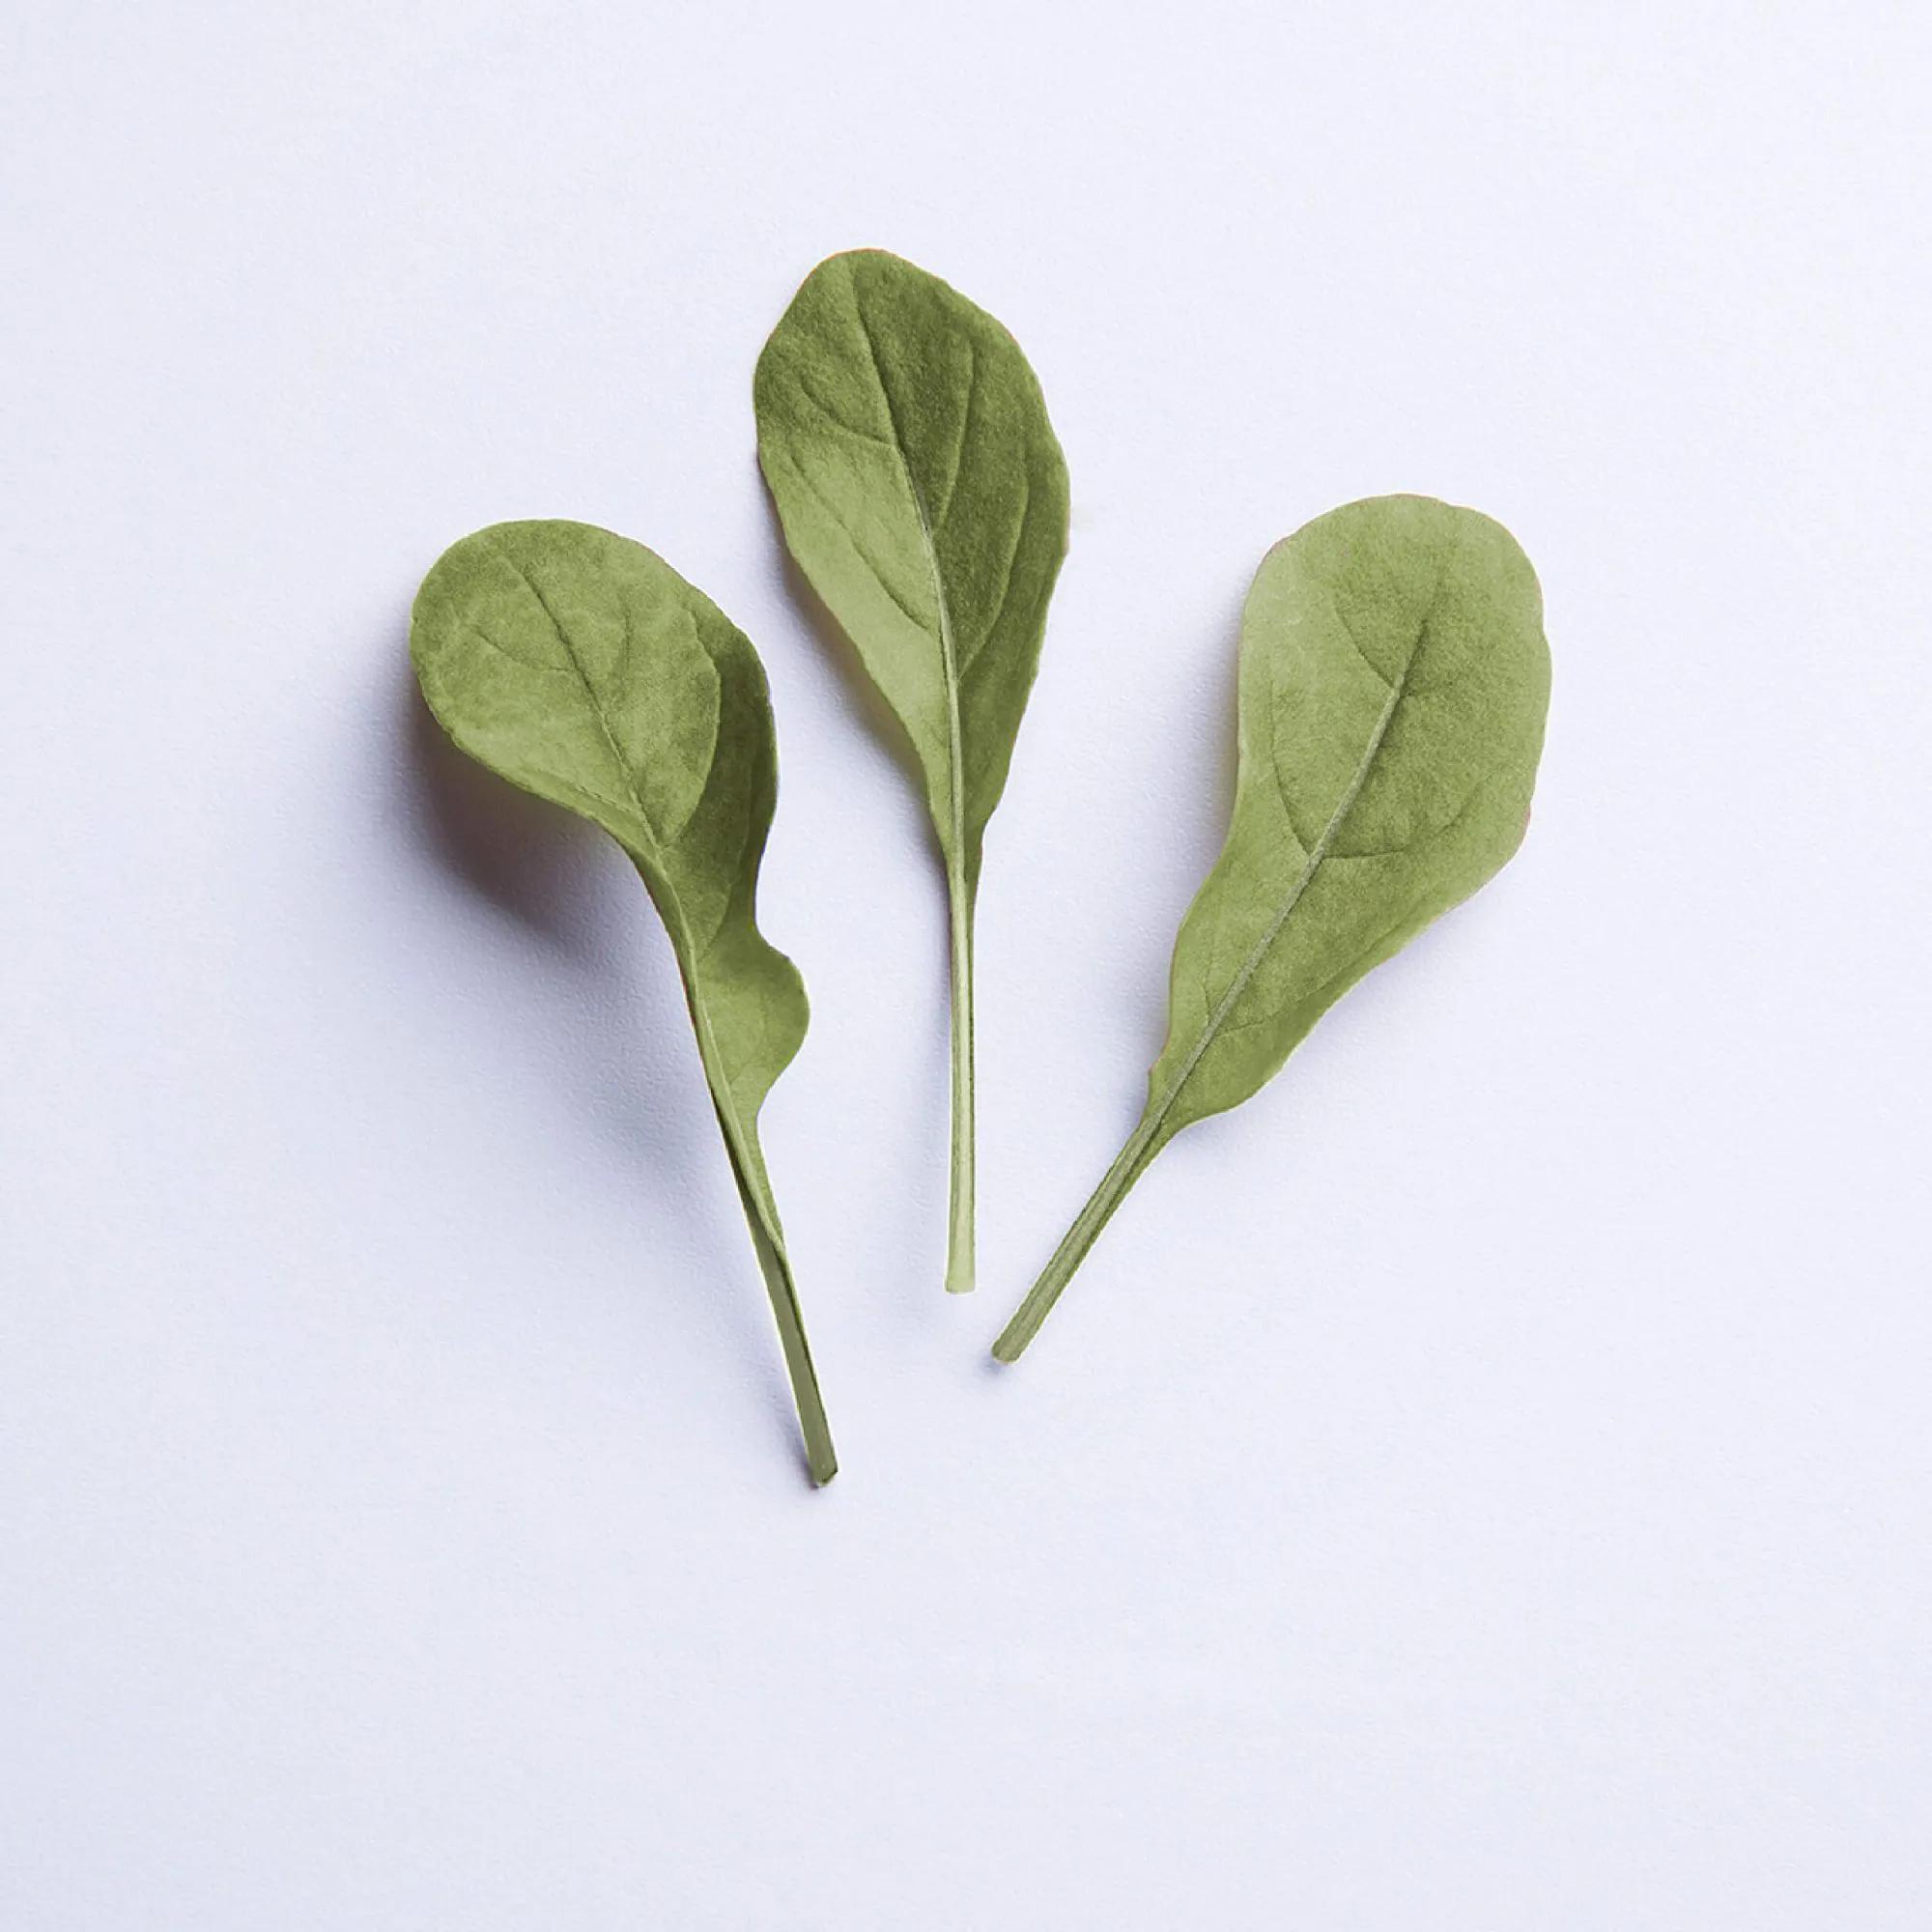 Sementes para plantar Rúcula Baby Leaf em vasos autoirrigáveis RAIZ  - Vasos Raiz Loja Oficial